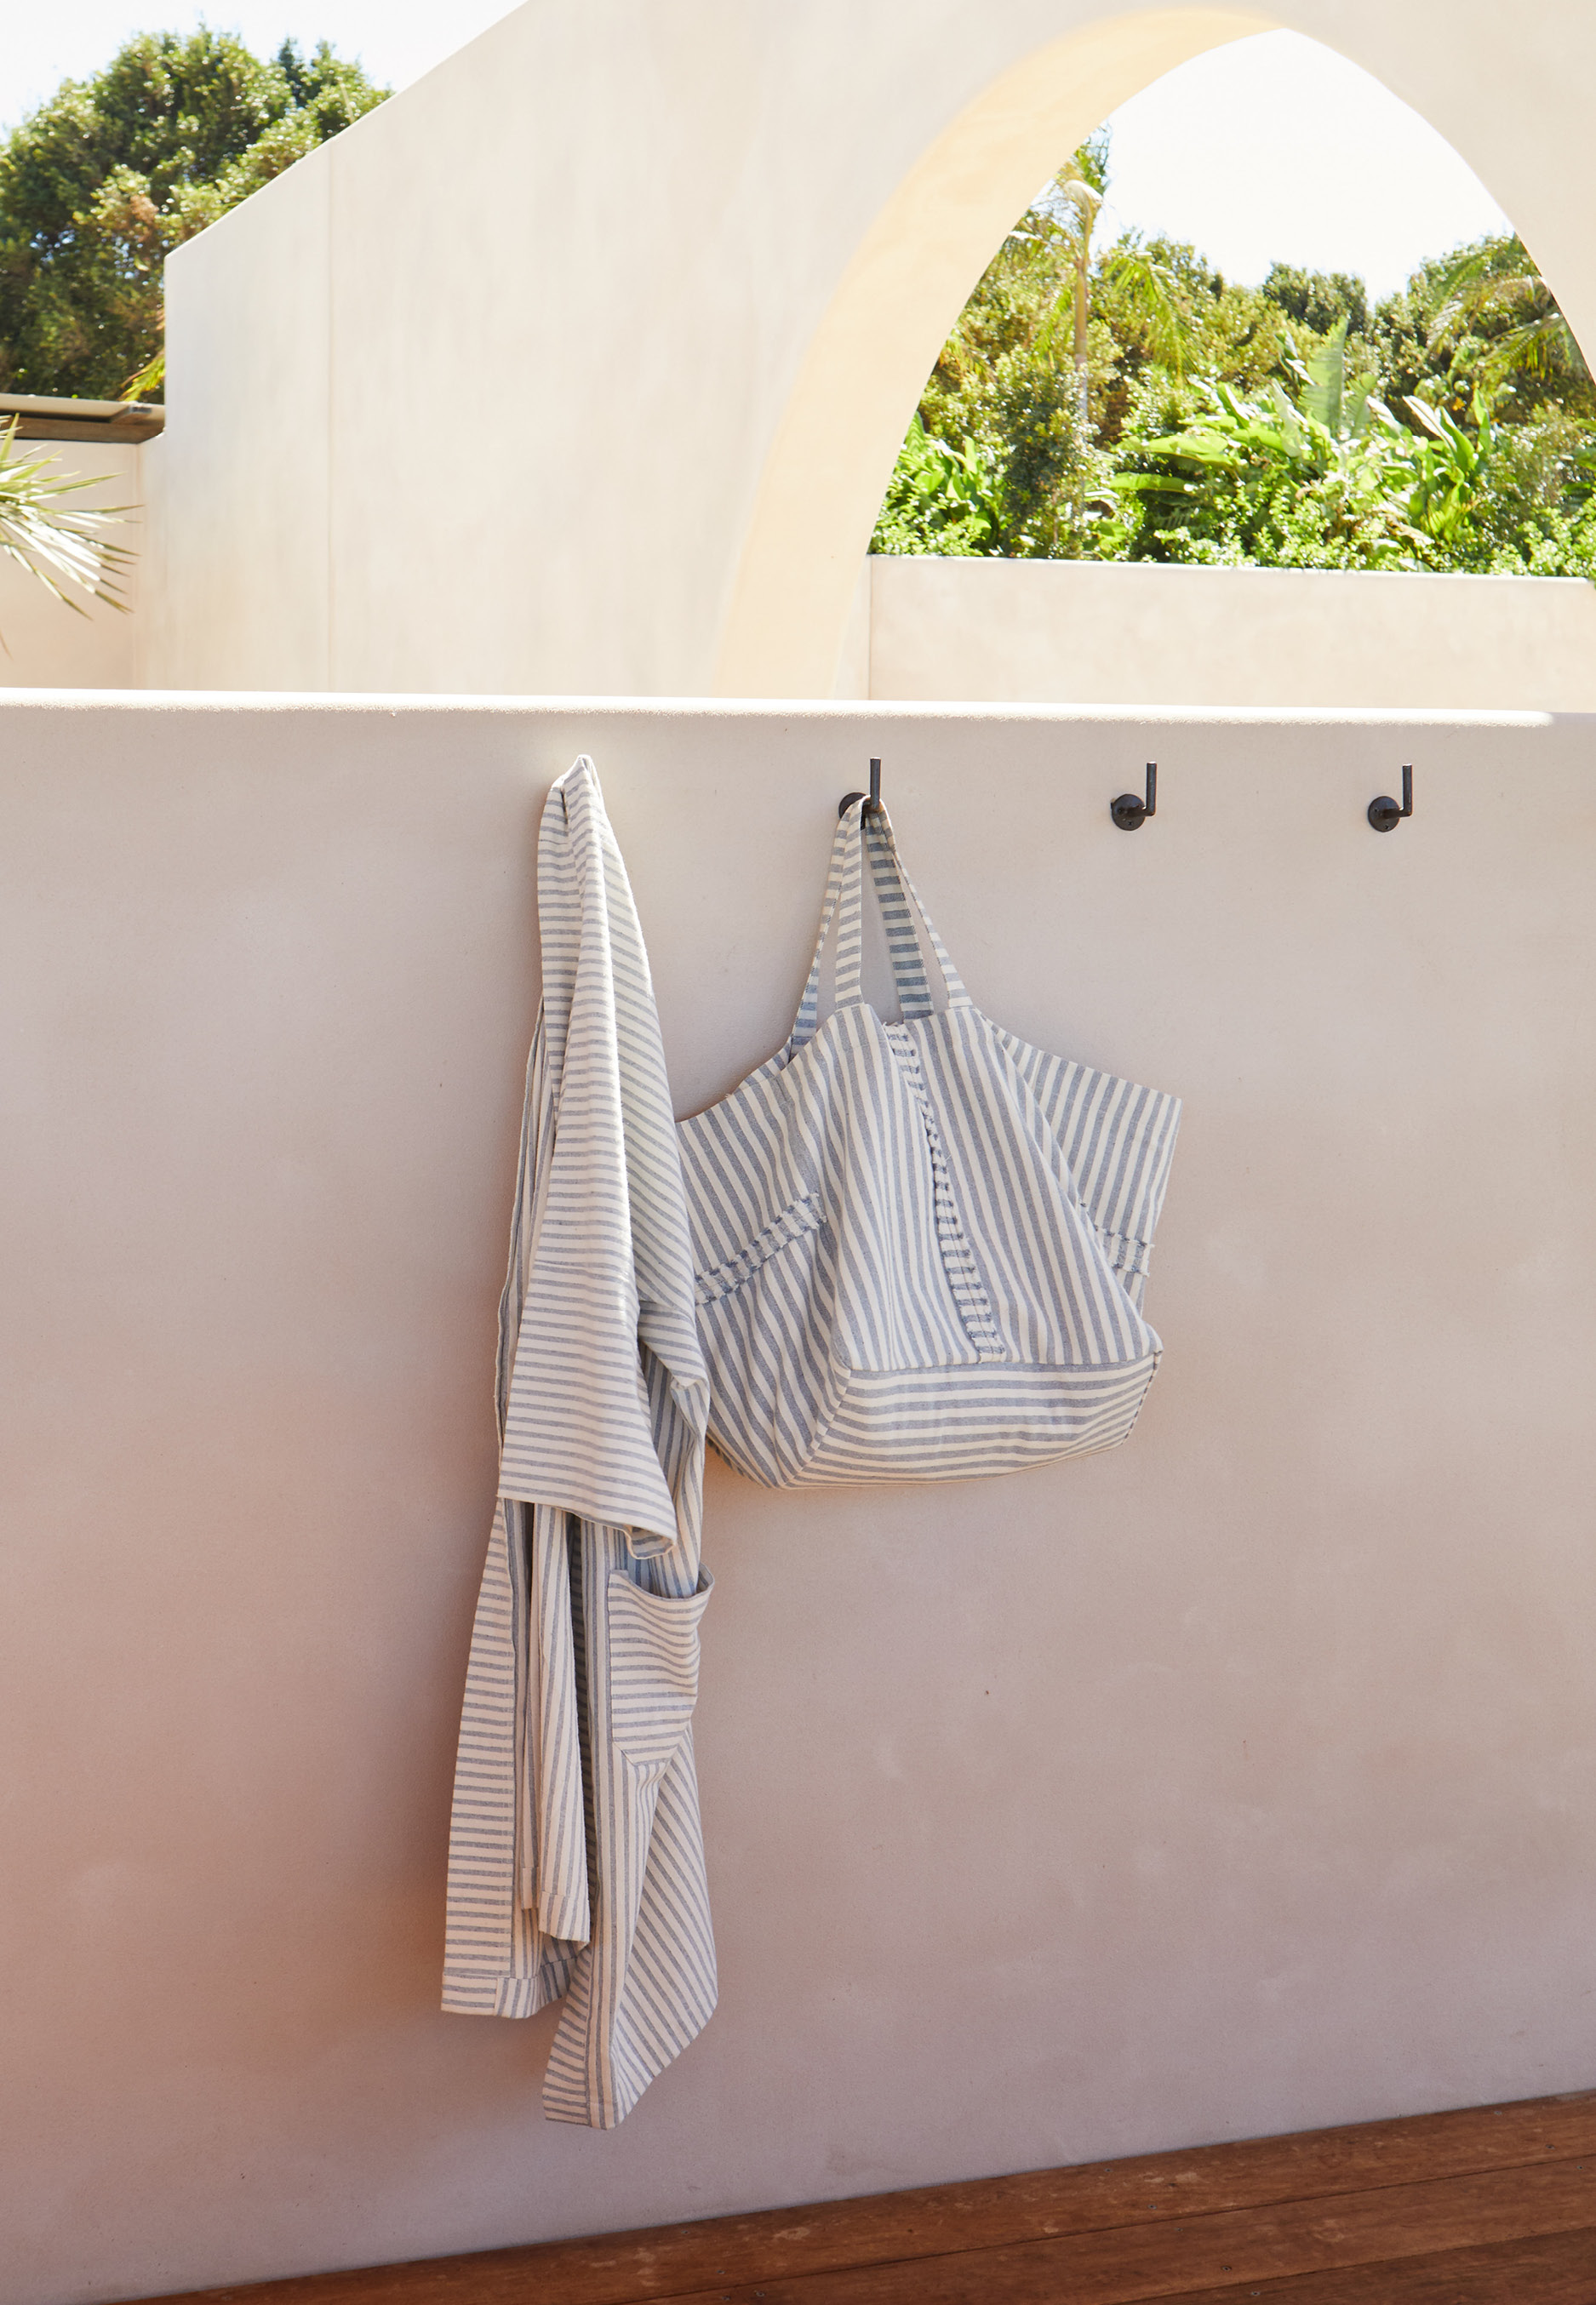 Upcycled Denim Kimono & Tote - Coming soon.